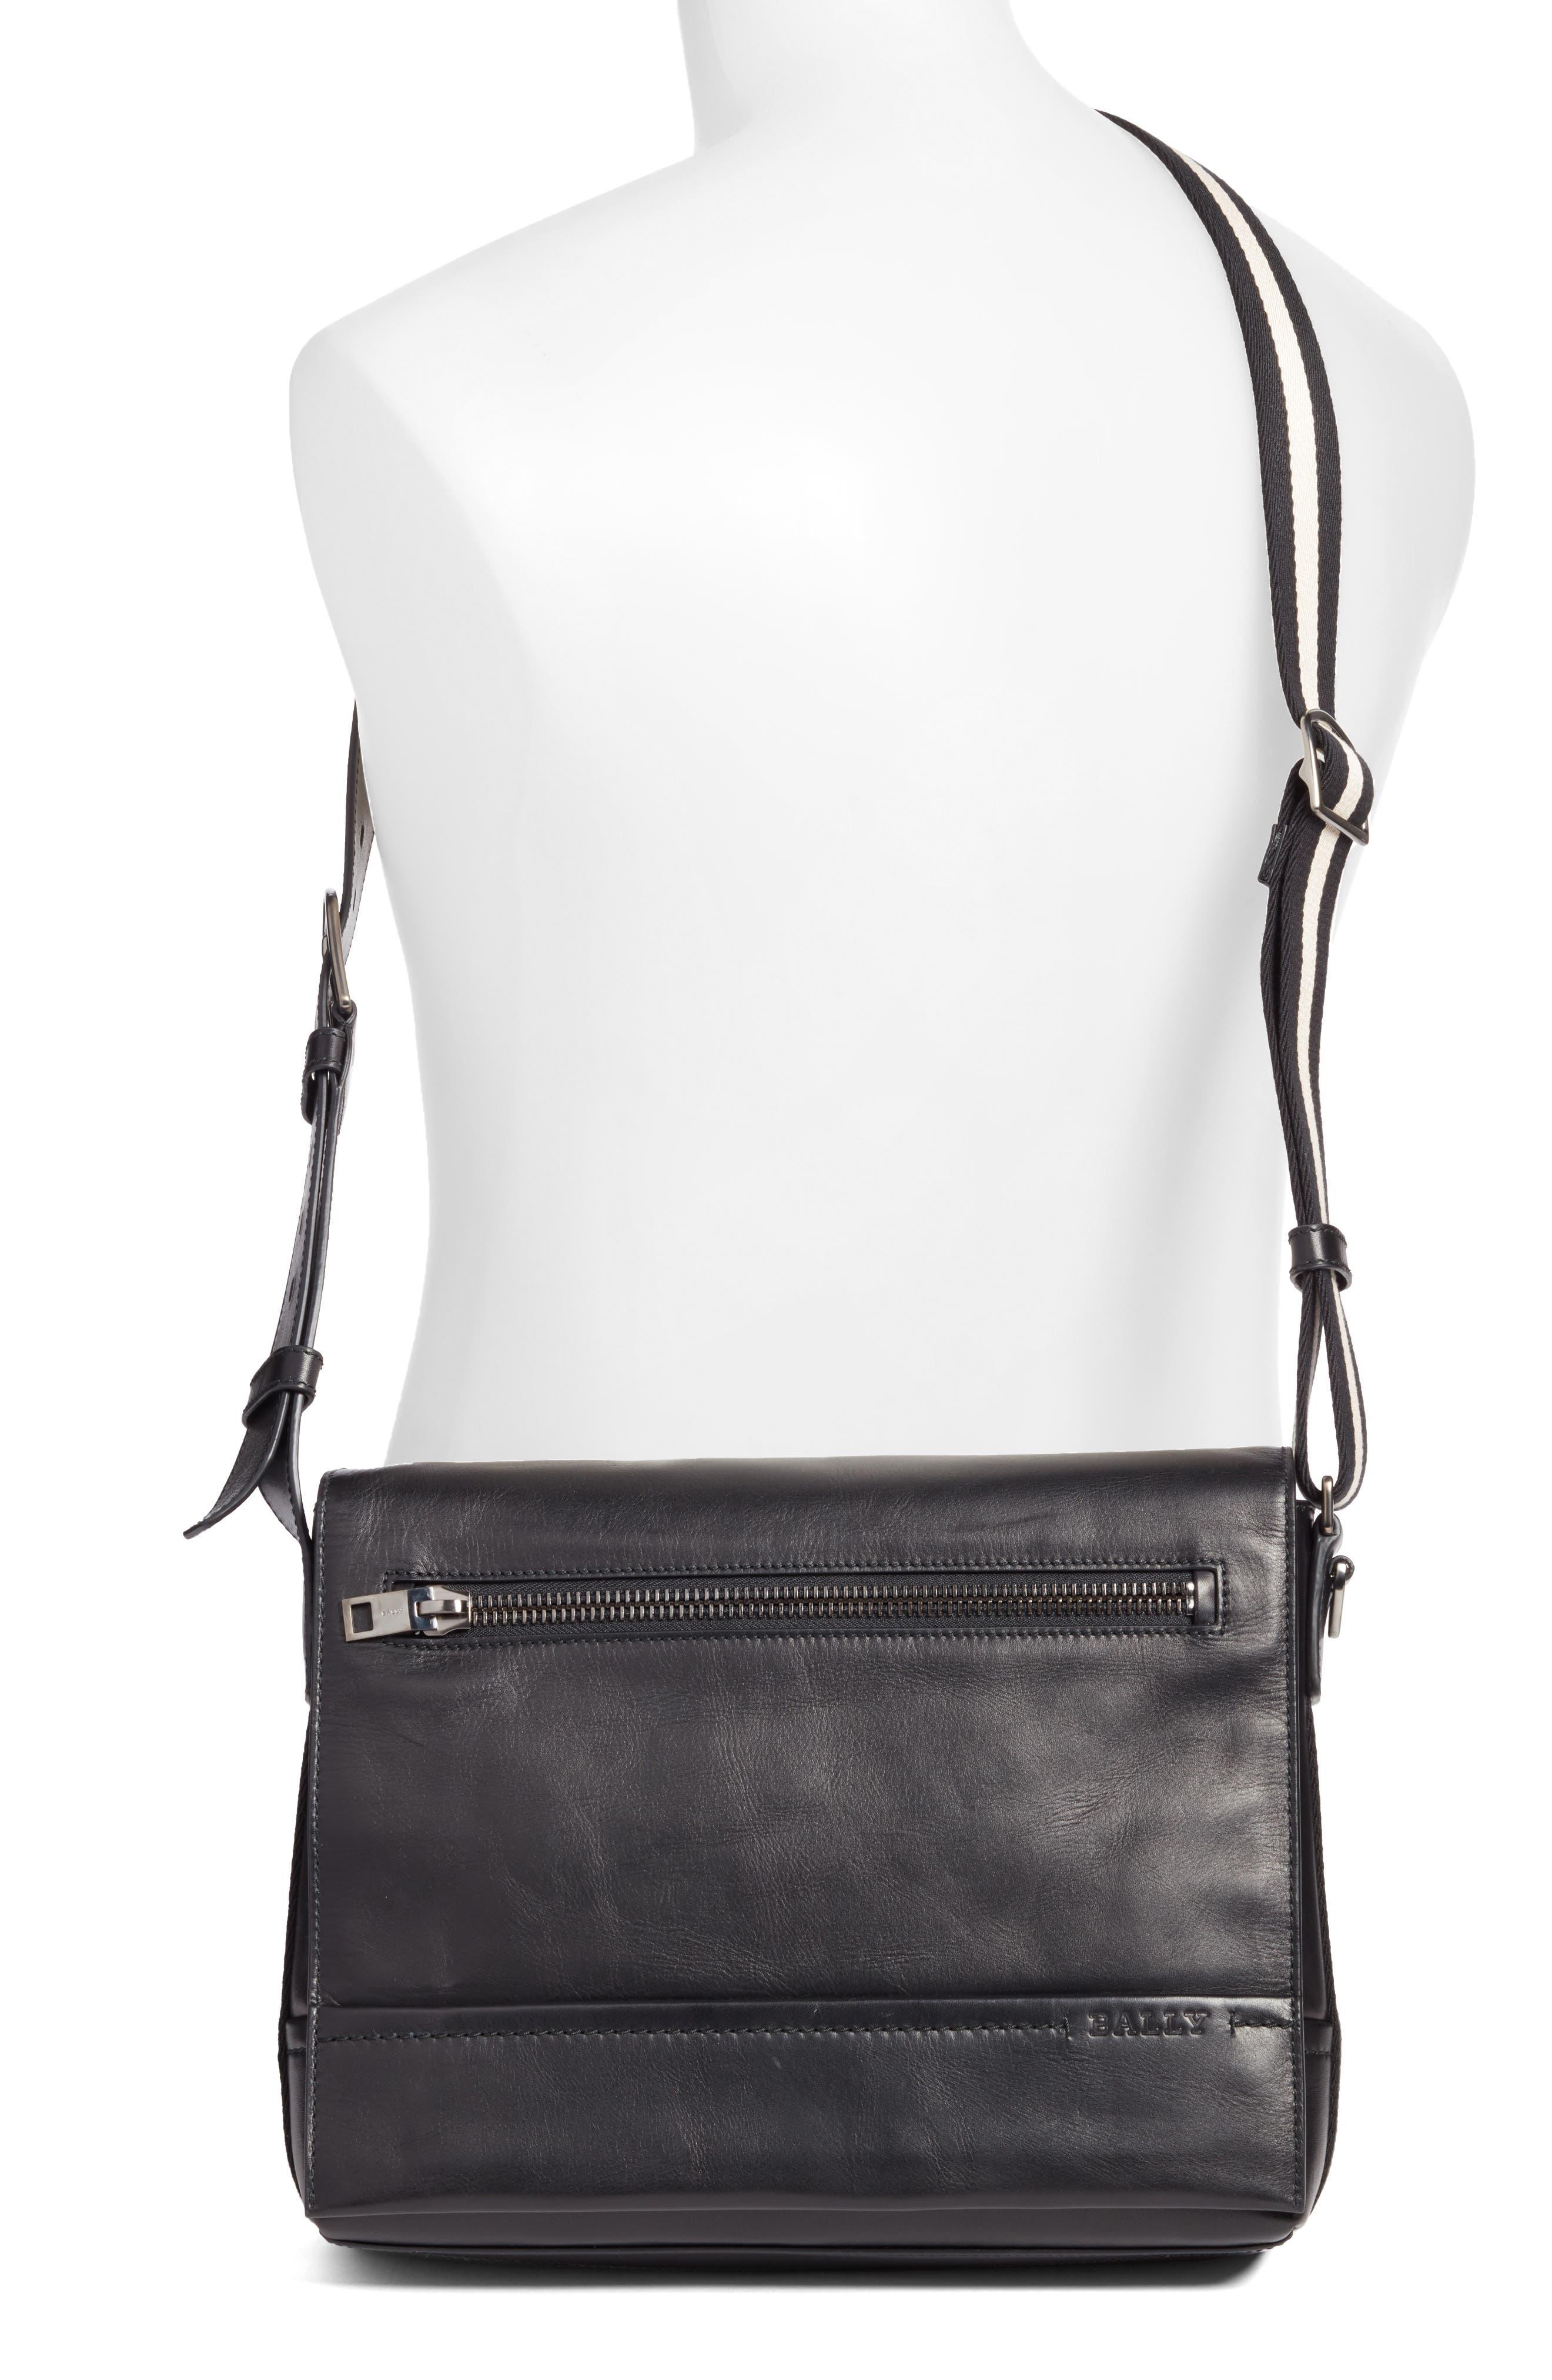 Tamrac Leather Messenger Bag,                             Alternate thumbnail 2, color,                             001